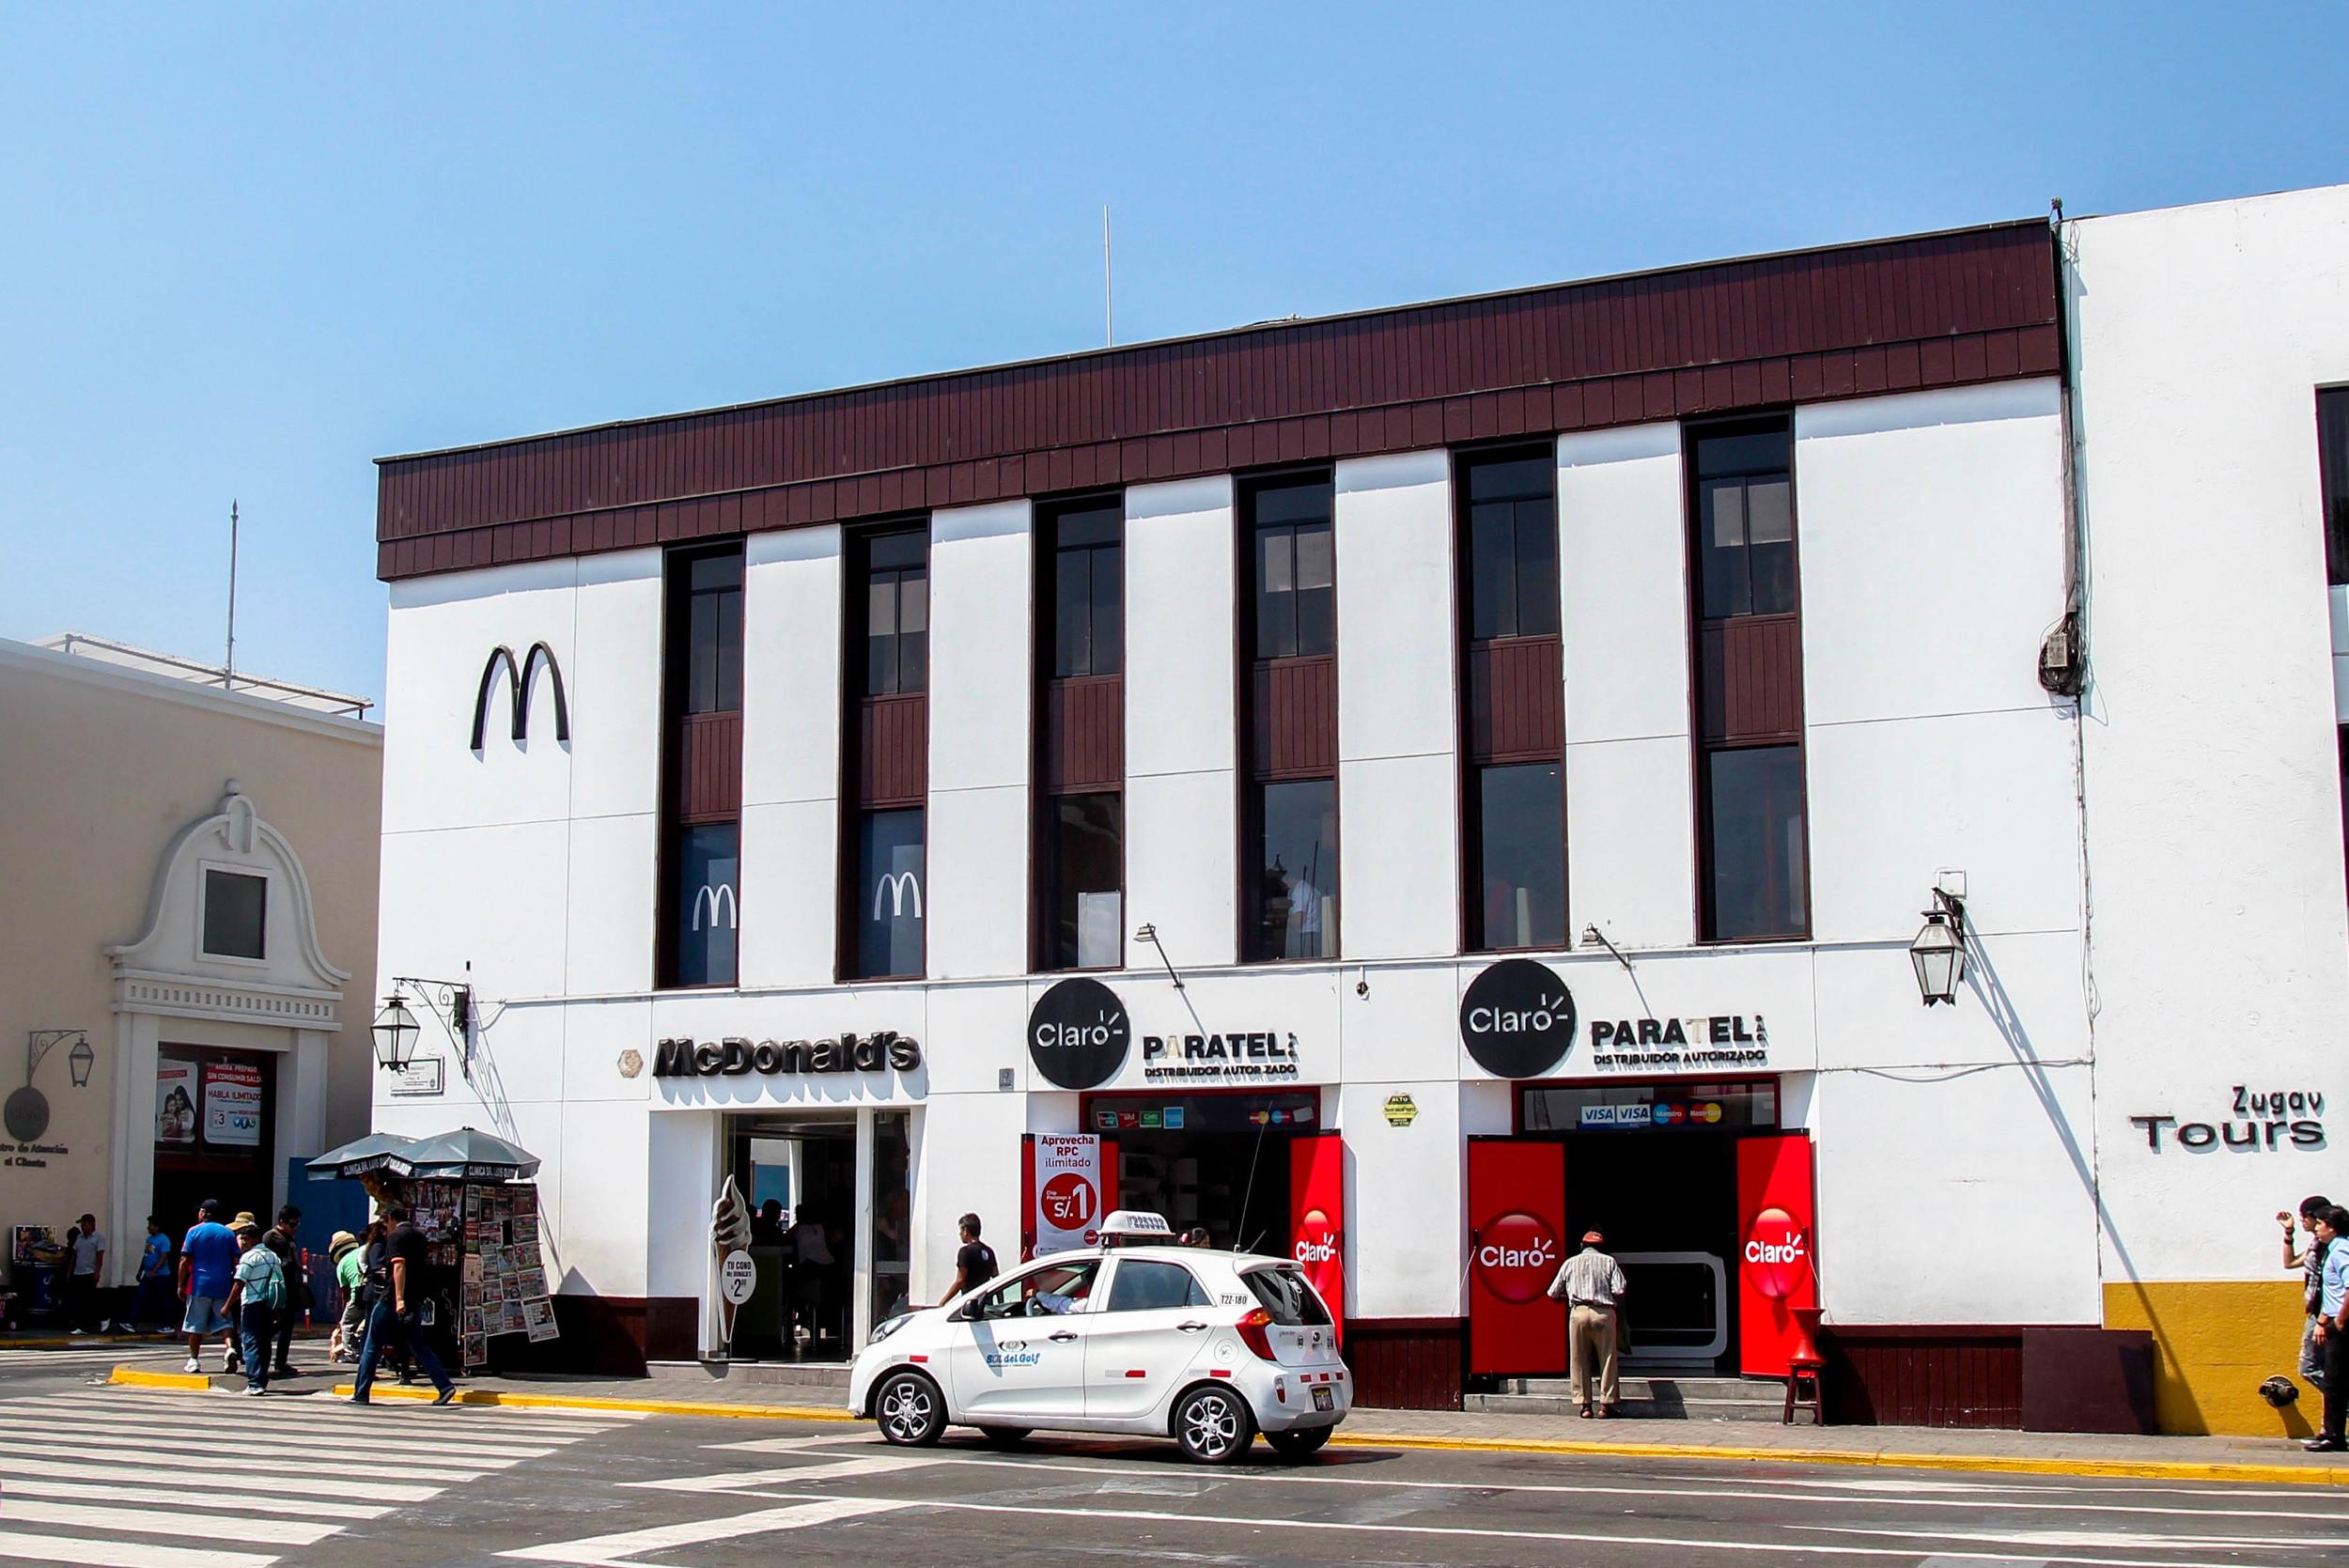 McDonald's on Trujillo's Plaza del Armas